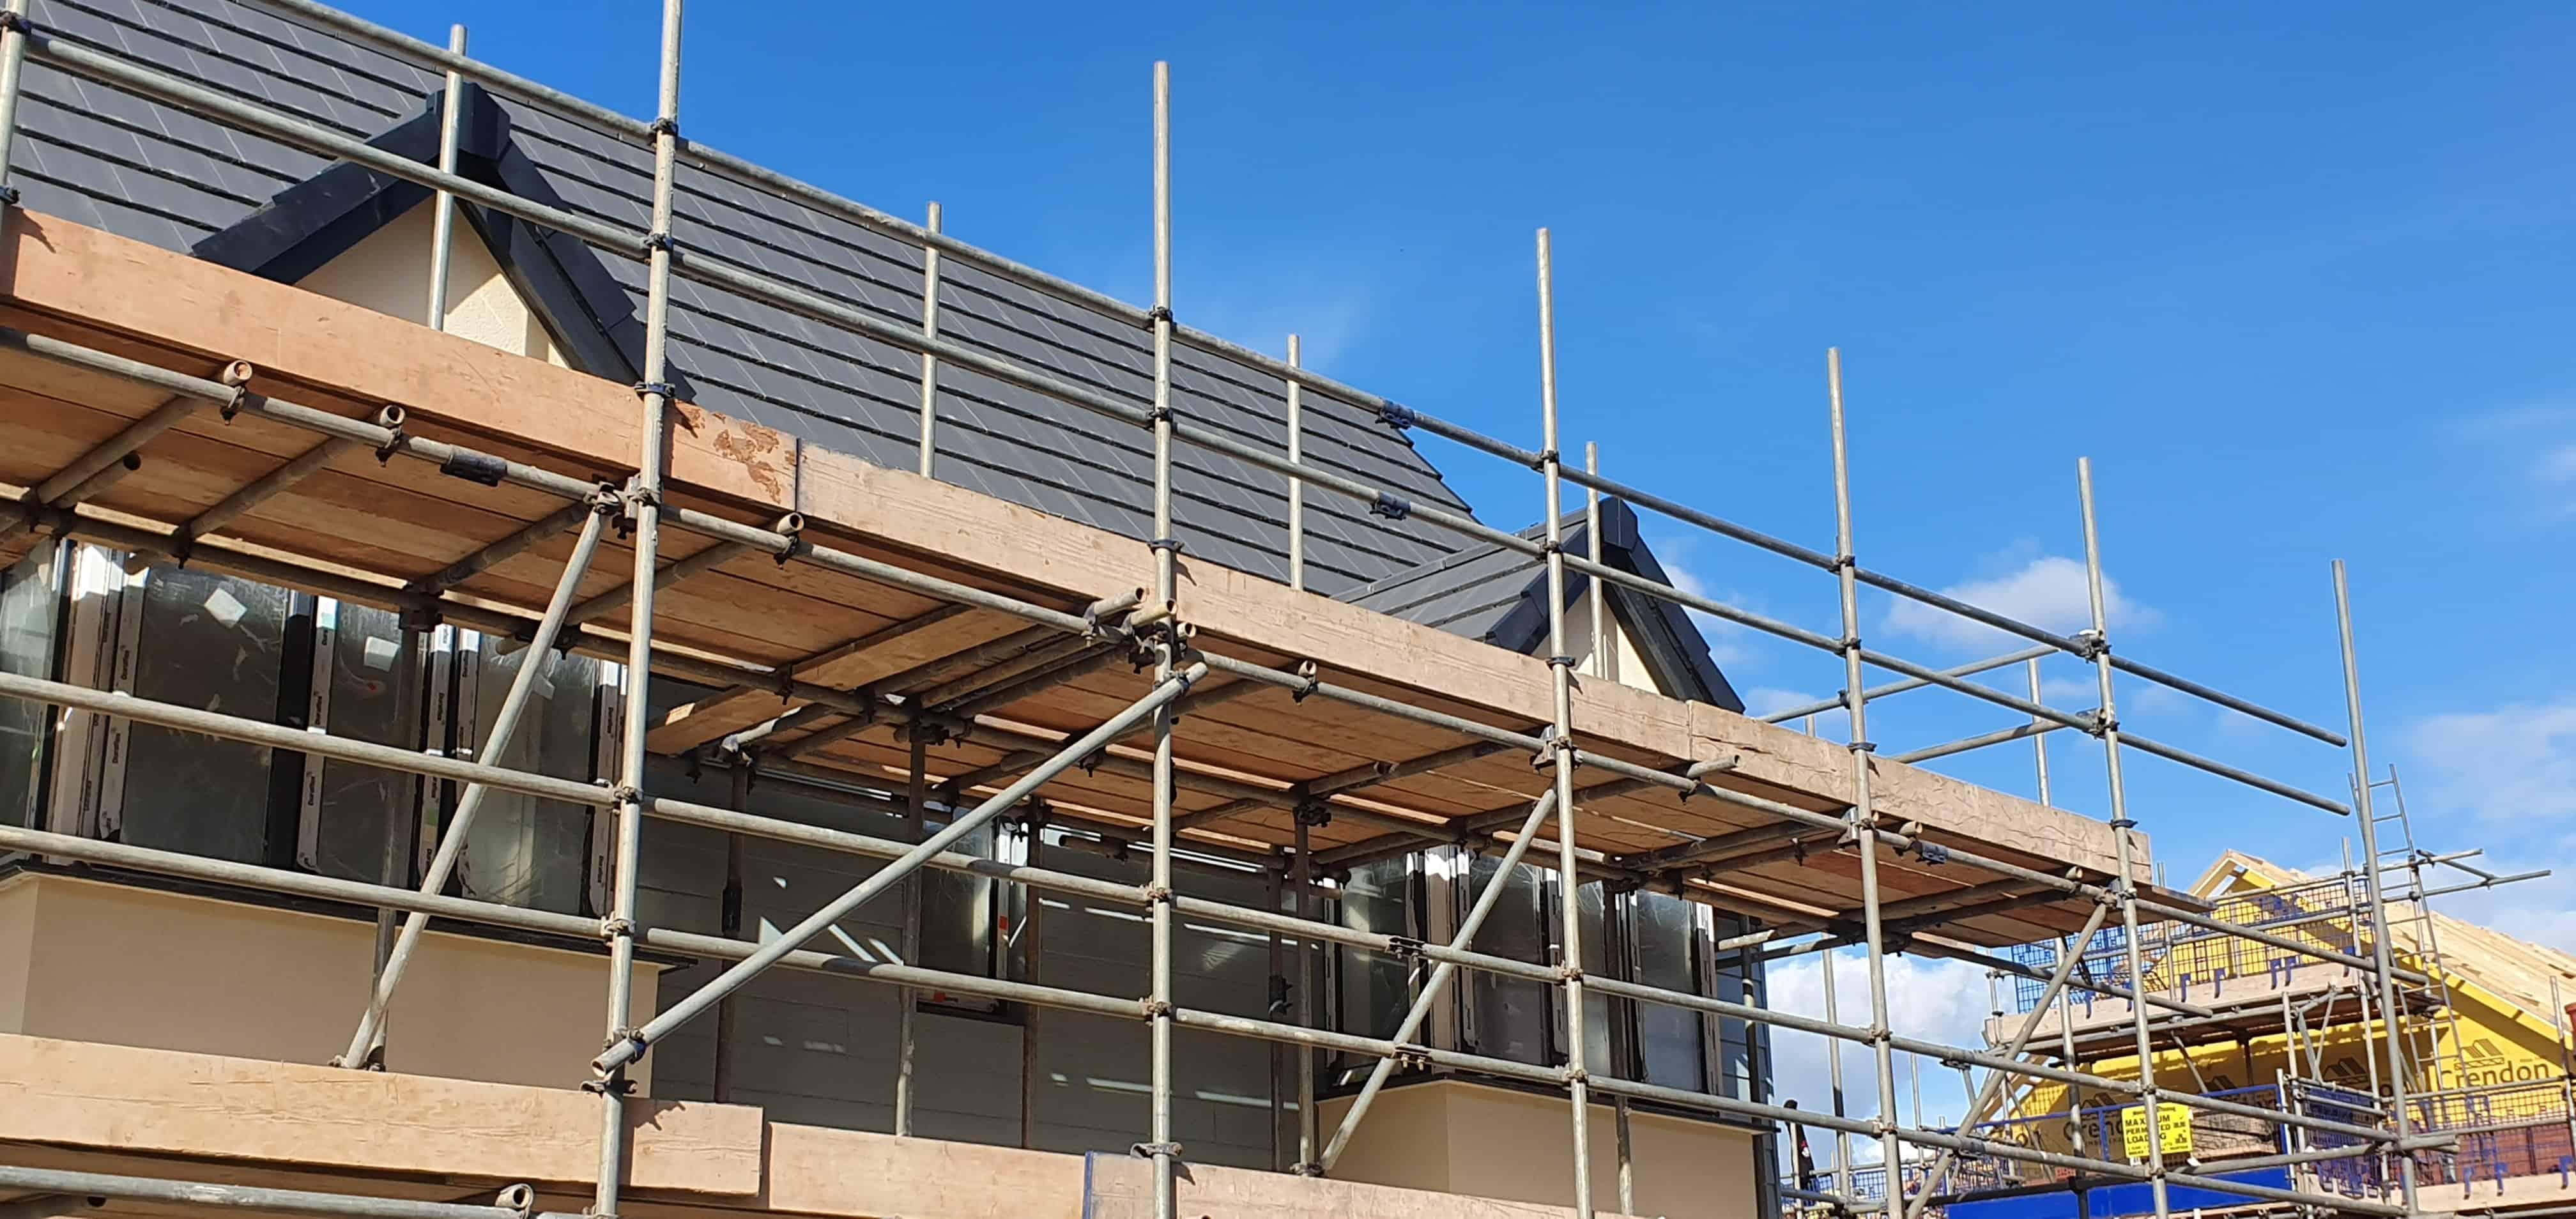 Residential property development finance